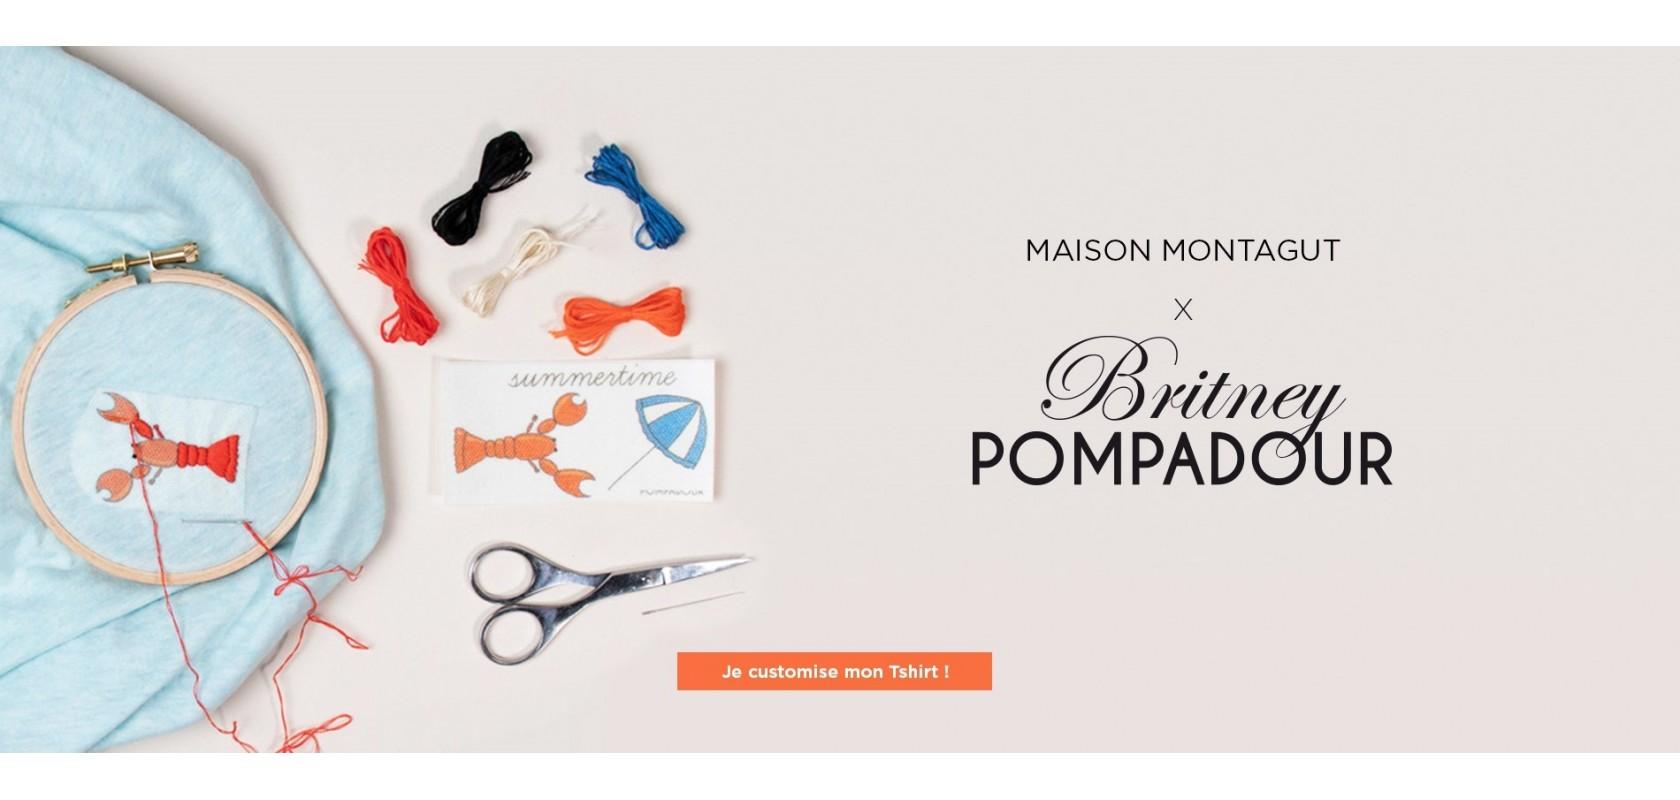 clothing embroidery Maison Montagut